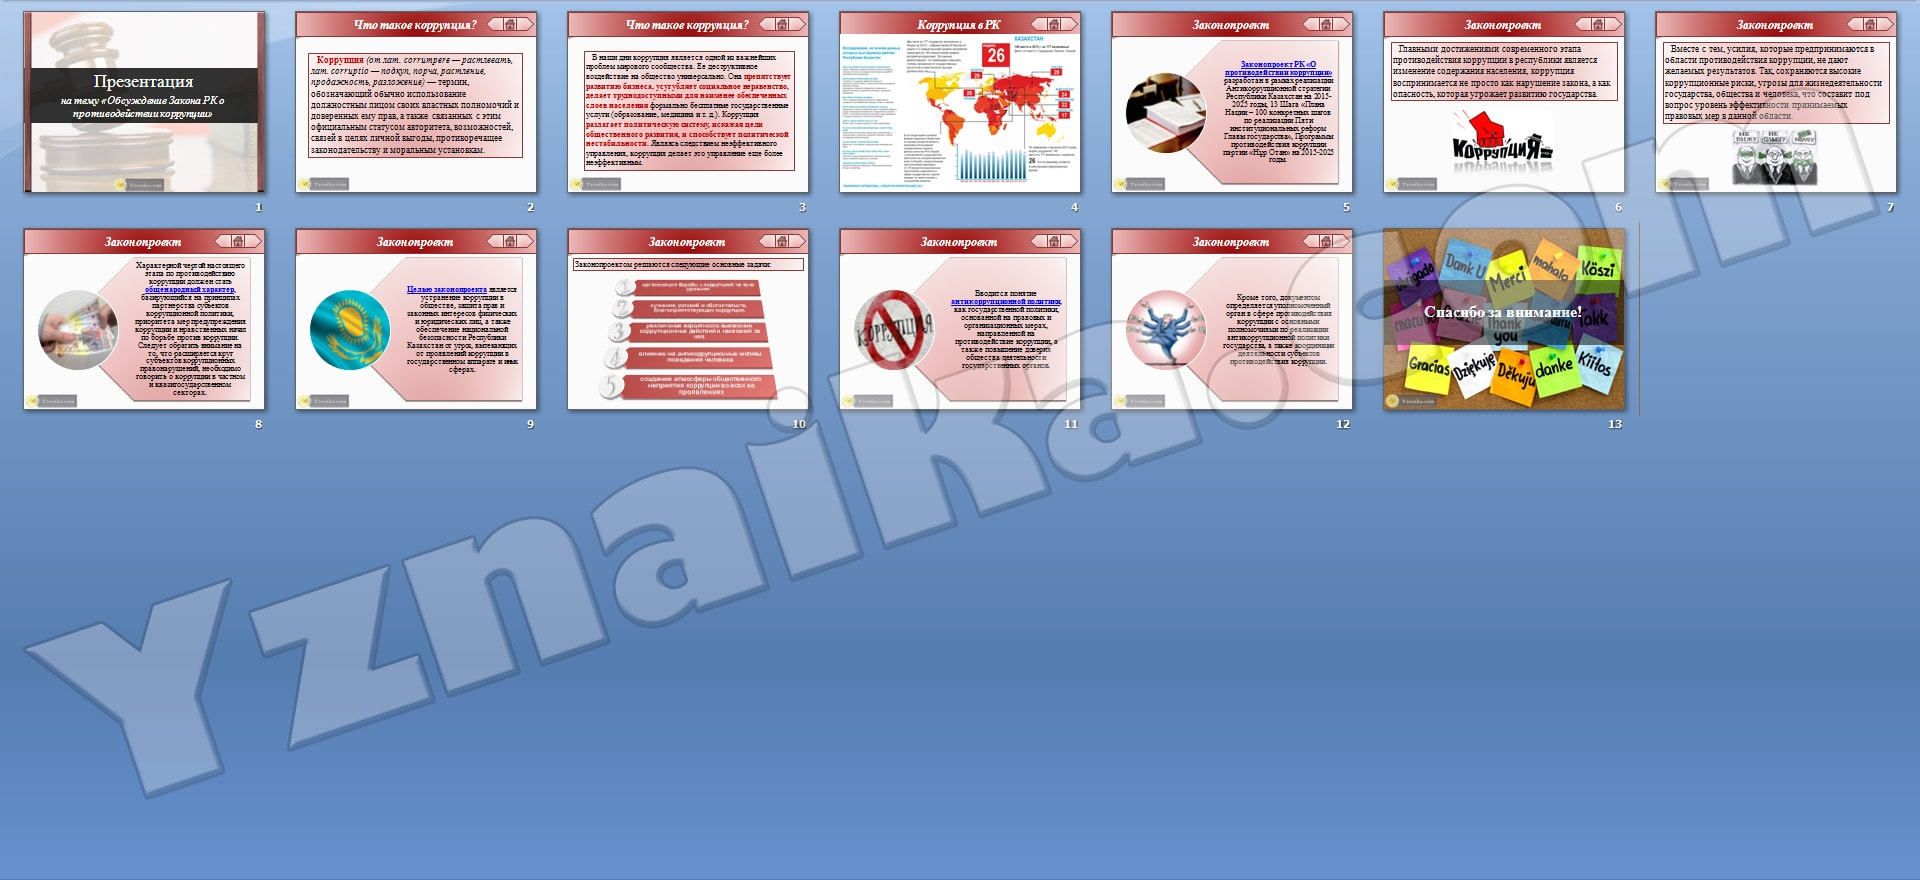 Закон о бухгалтерском учёте и отчётности рб